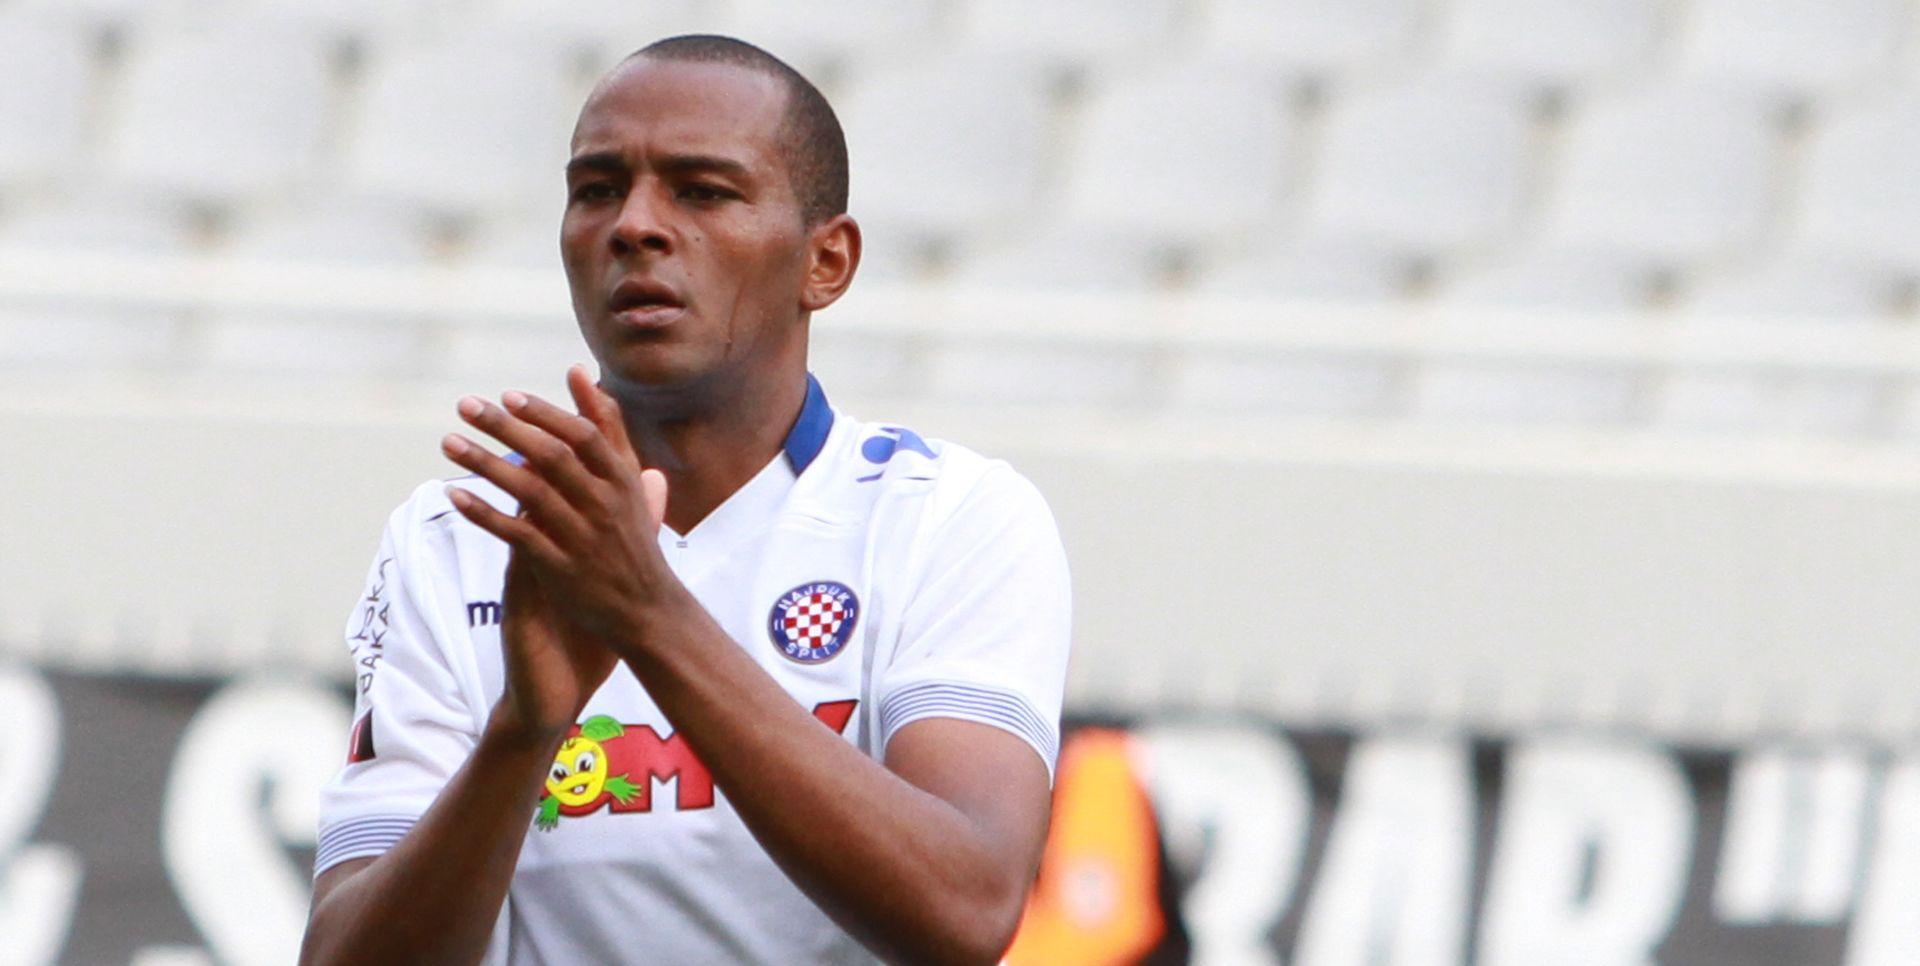 VIDEO: PORAZ NA POČETKU PRIPREMA Hajduk poražen od Ferencvaroša 4:2